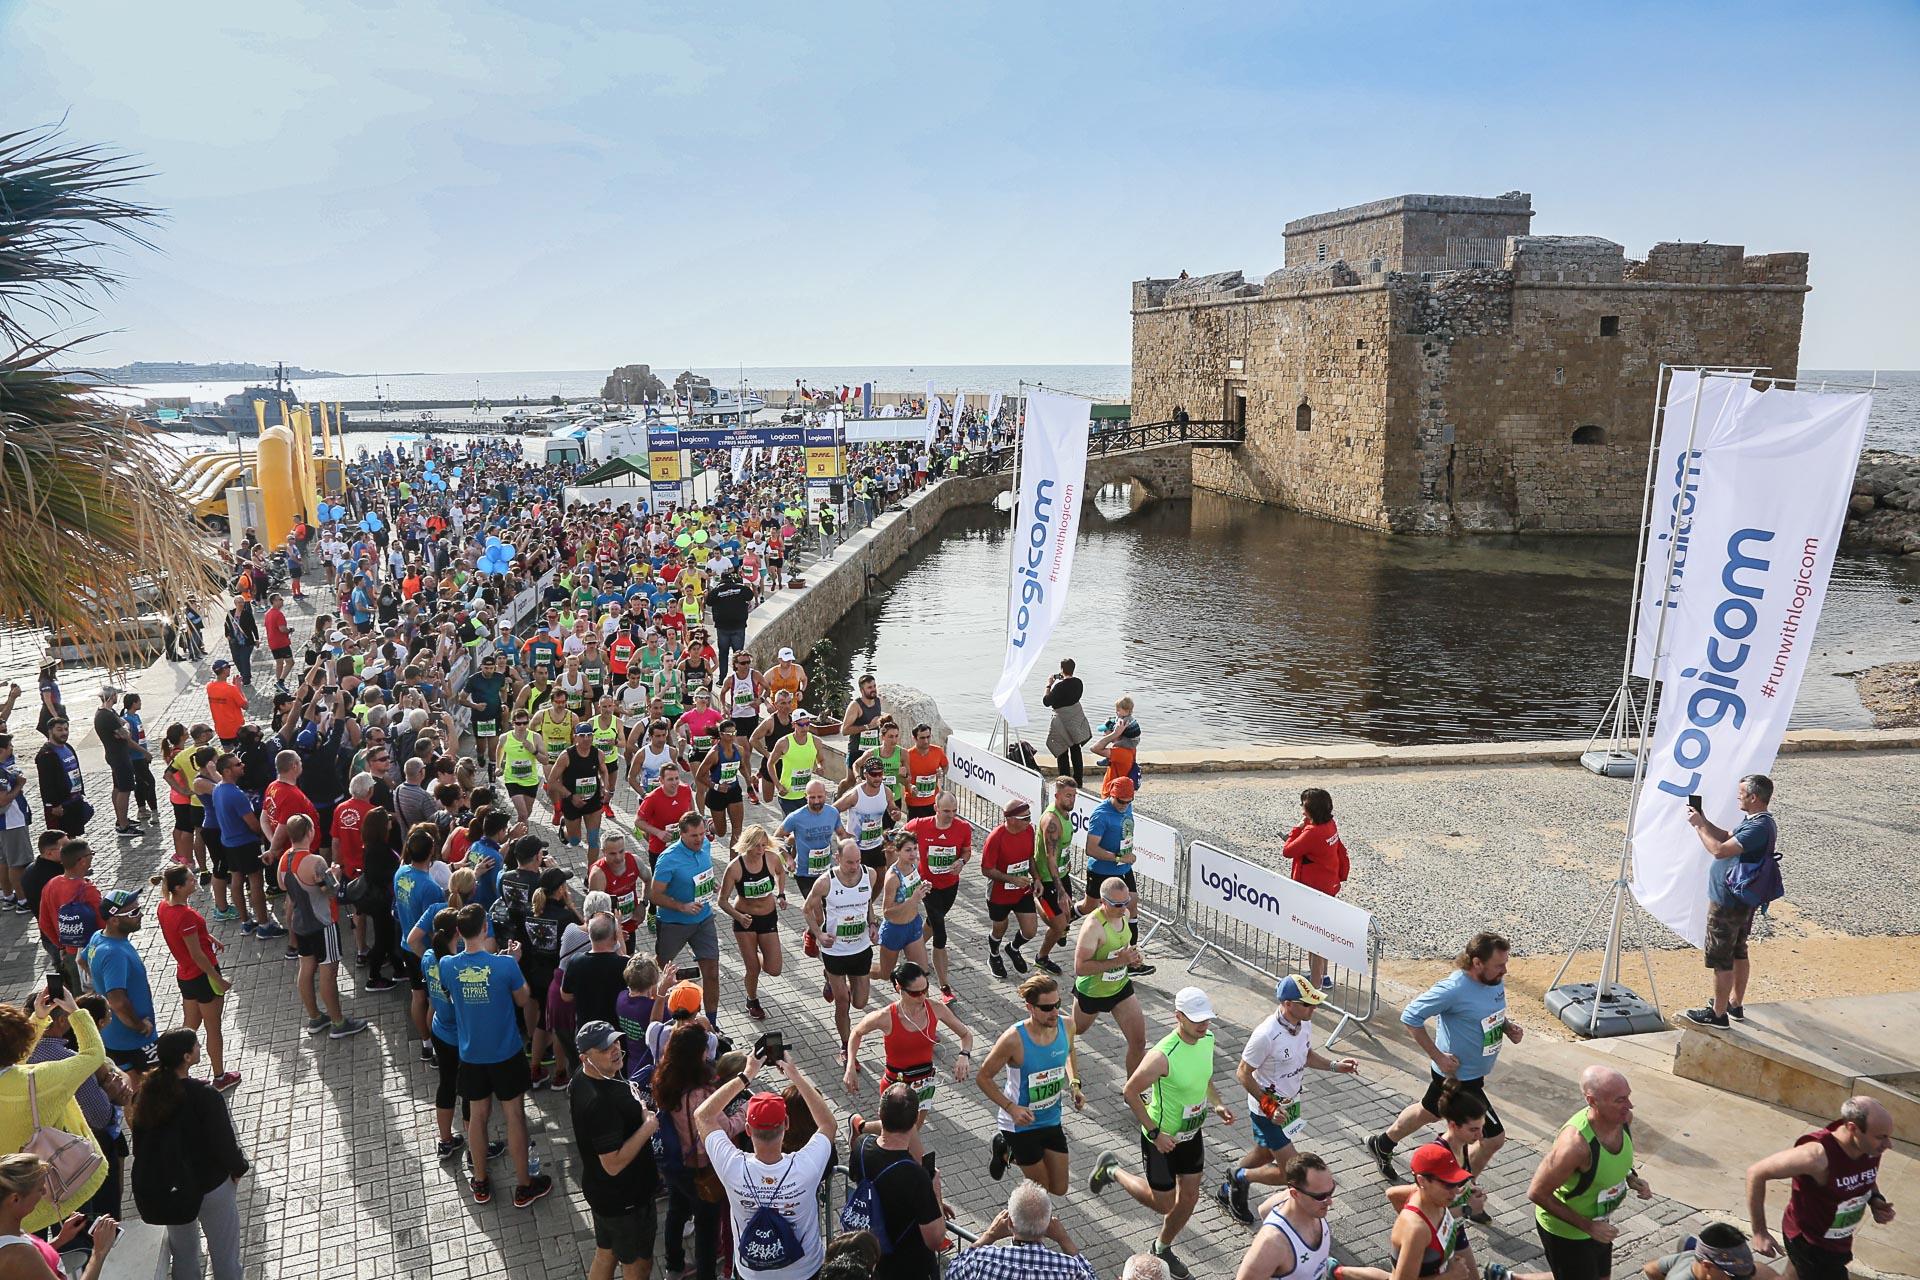 21-й Logicom Cyprus Marathon, Пафос, Кіпр